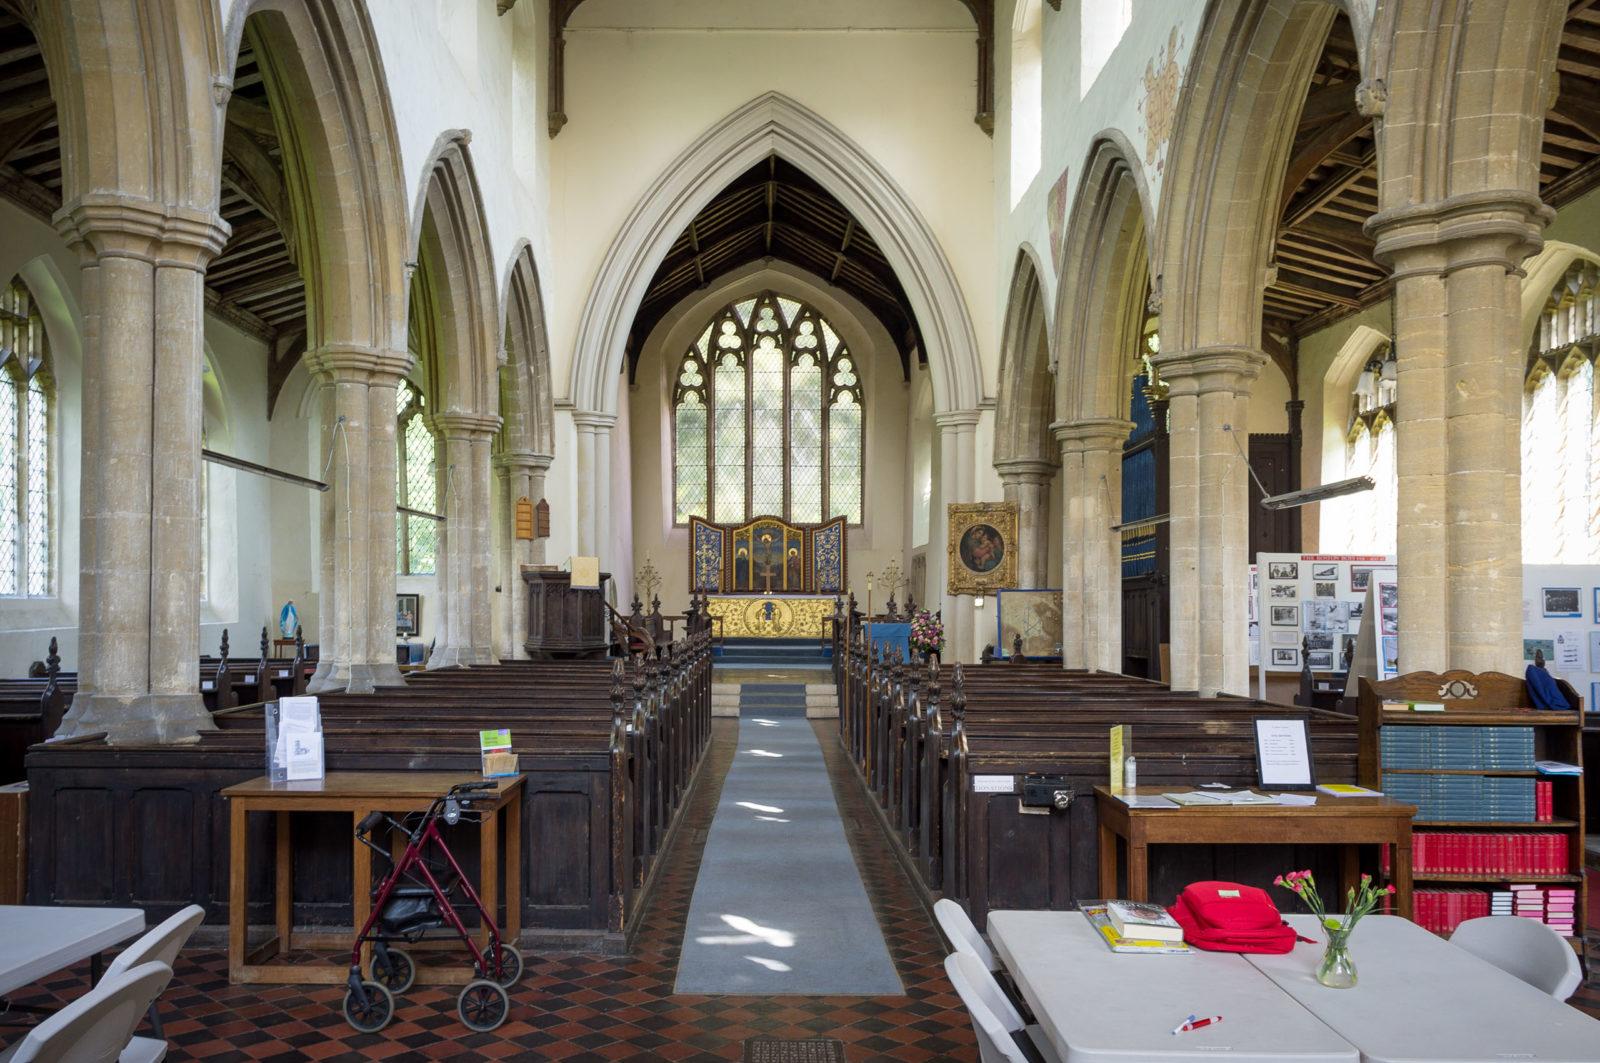 St. Mary, Great Massingham